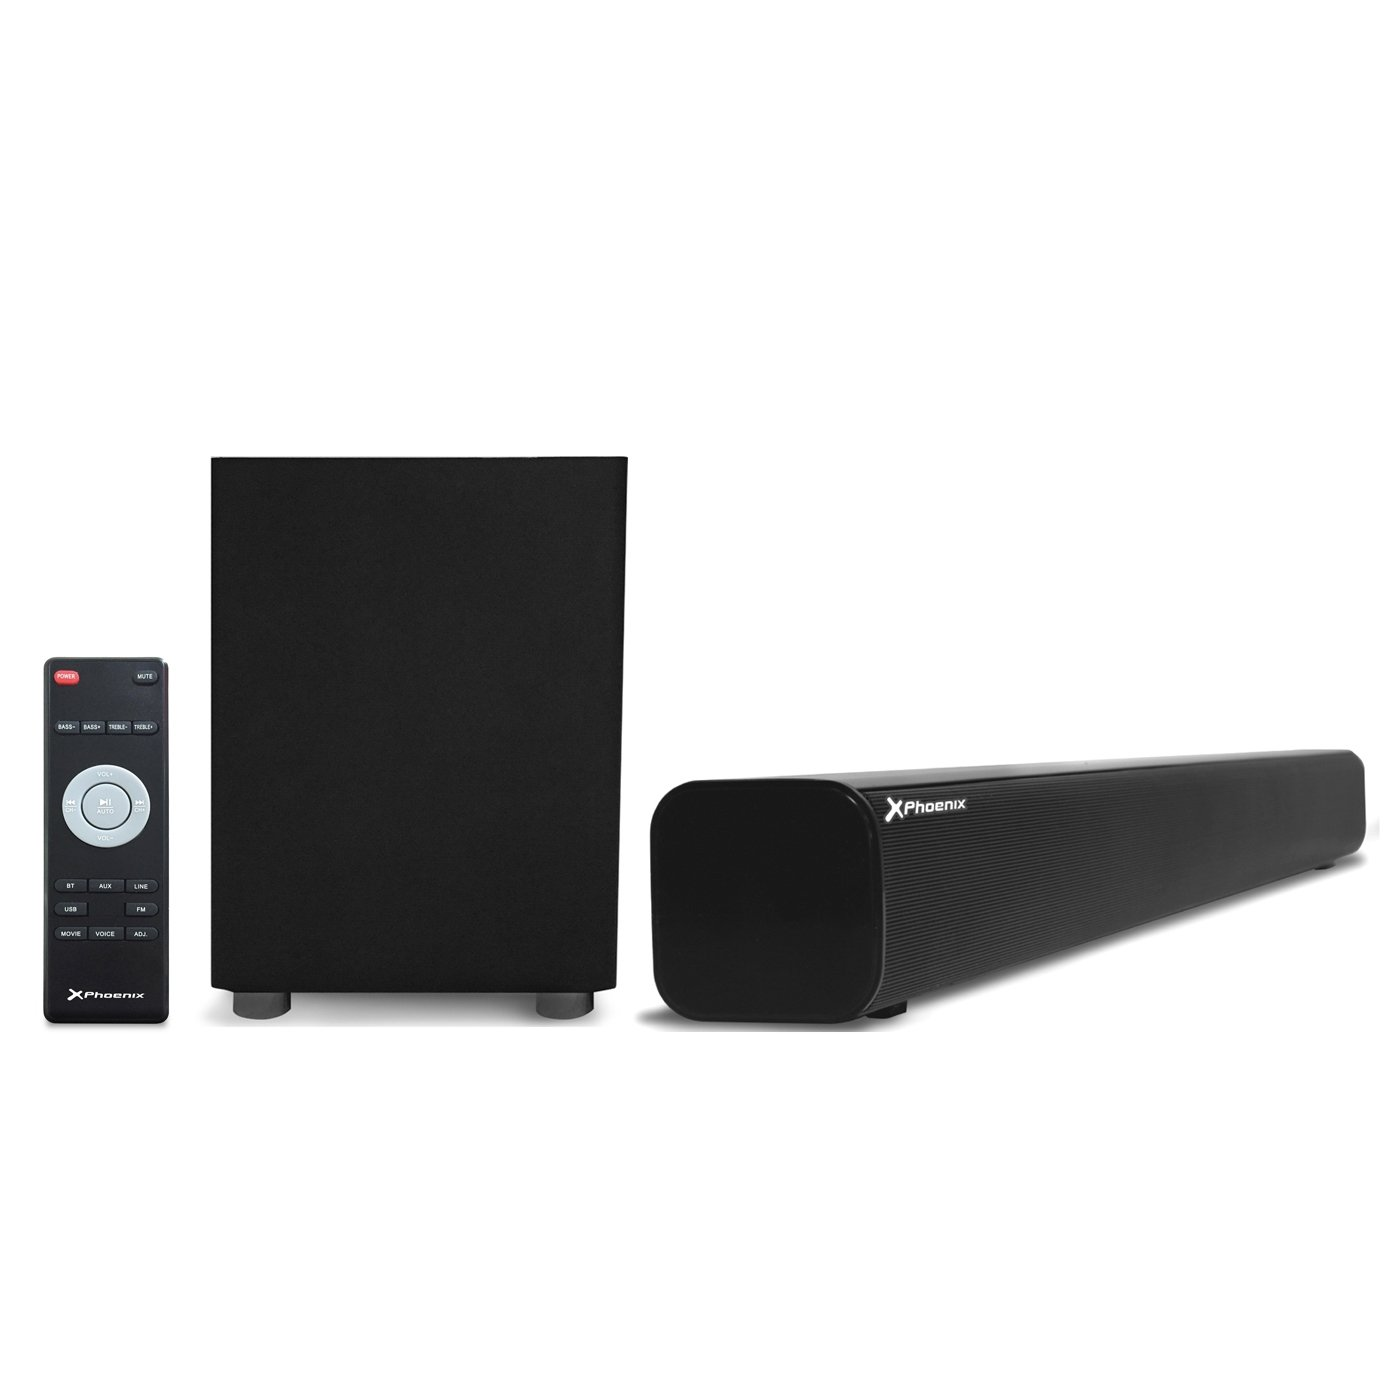 Phoenix Technologies –  Kit barre de son bluetooth + subwoofer Wireless Phoenix phsbbtwsub 25 W + 18 W/USB/Radio FM/Entré e/Sortie/subwoofer ACA